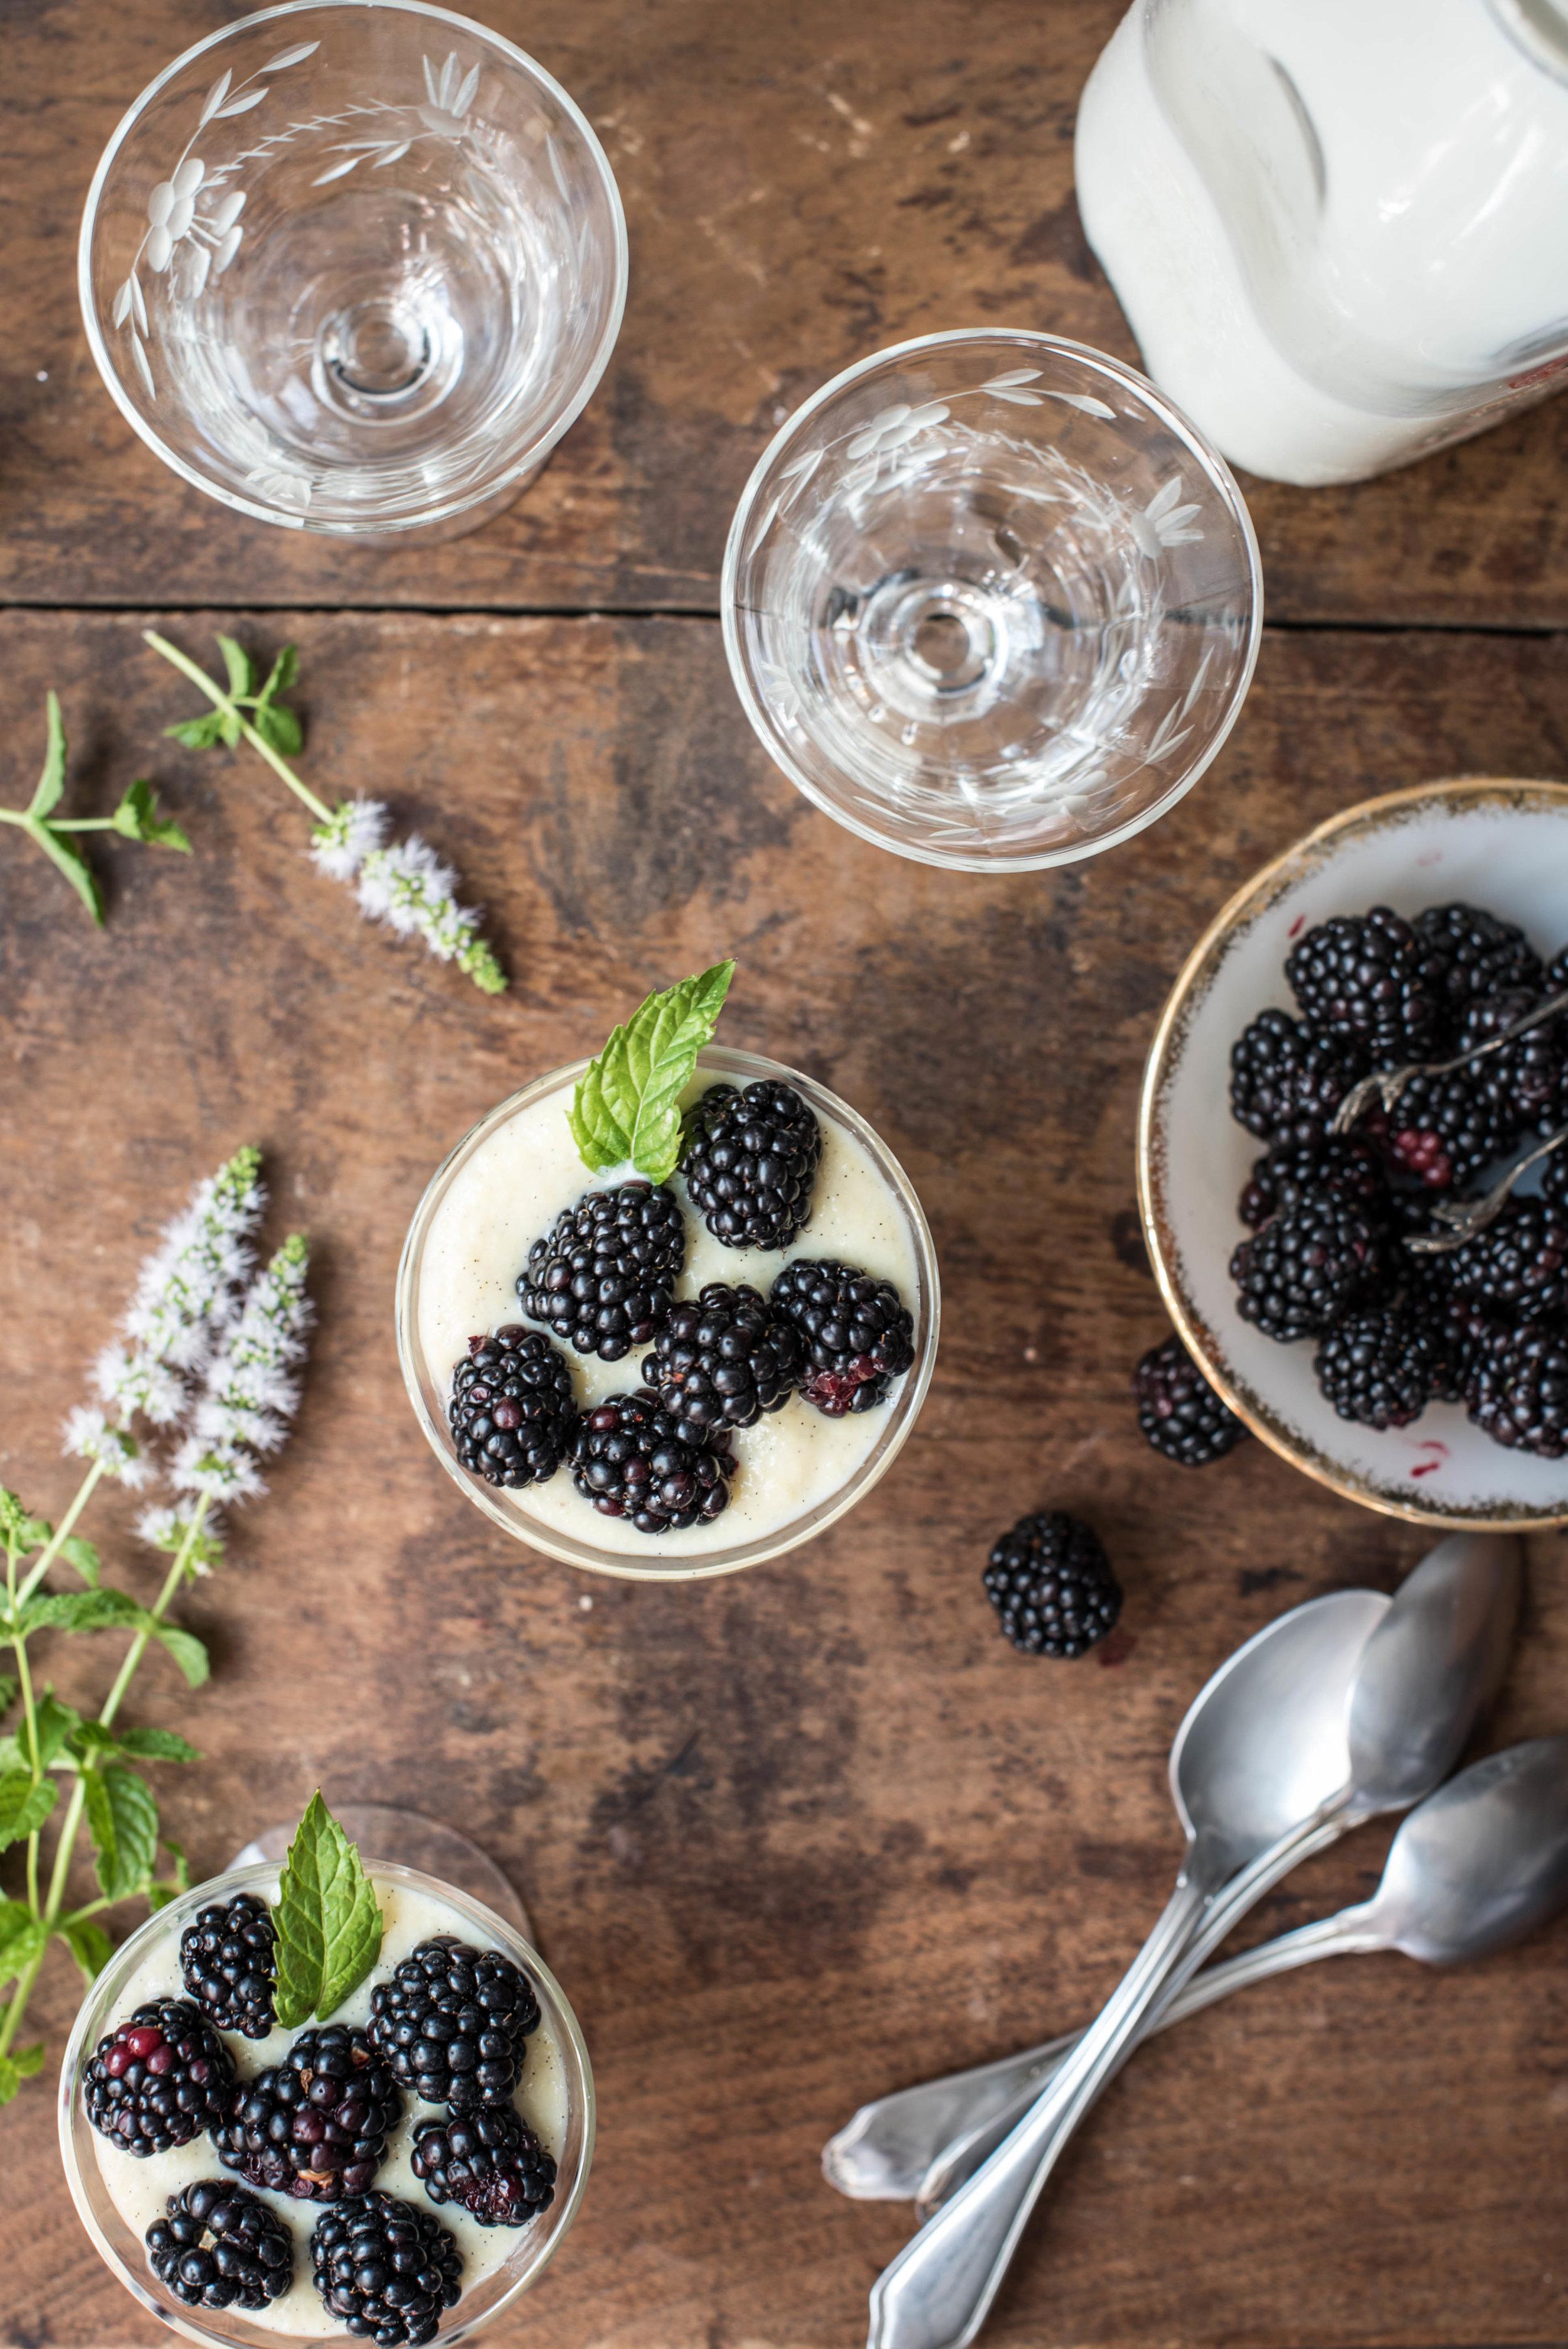 ROSE & IVY Journal Vanilla Bean Pudding